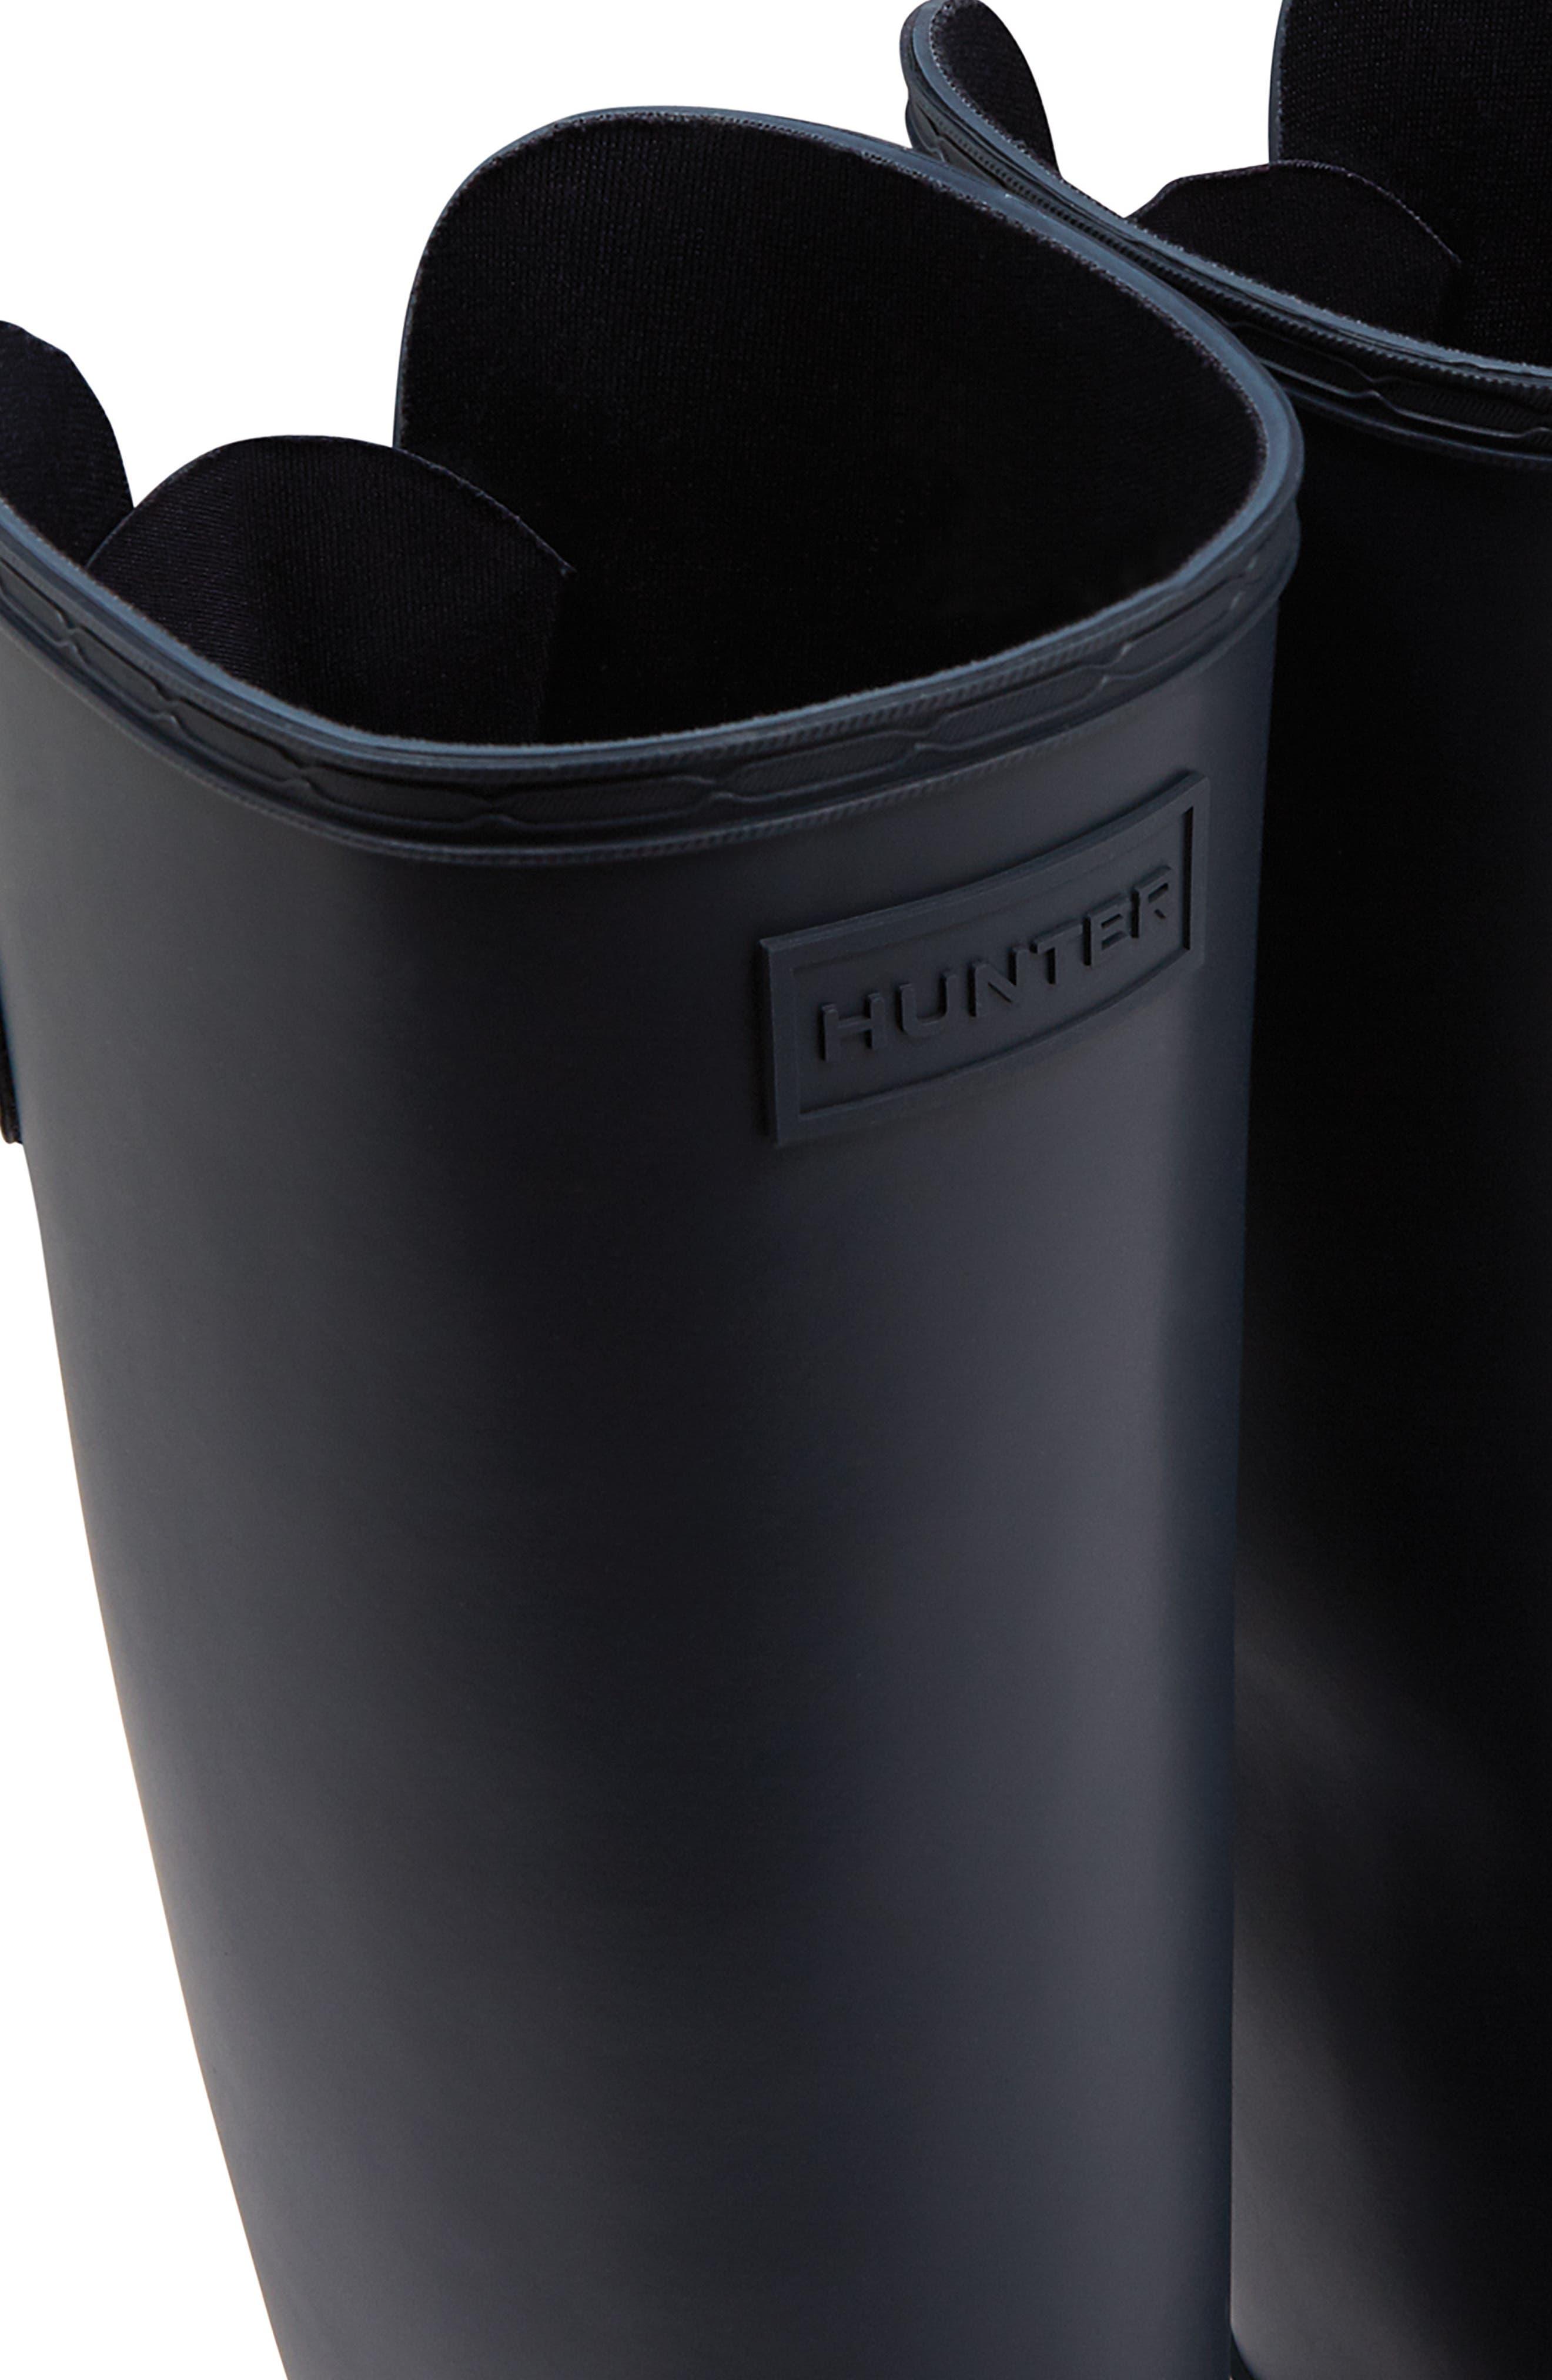 Refined Adjustable Back Knee High Waterproof Rain Boot,                             Alternate thumbnail 5, color,                             NAVY